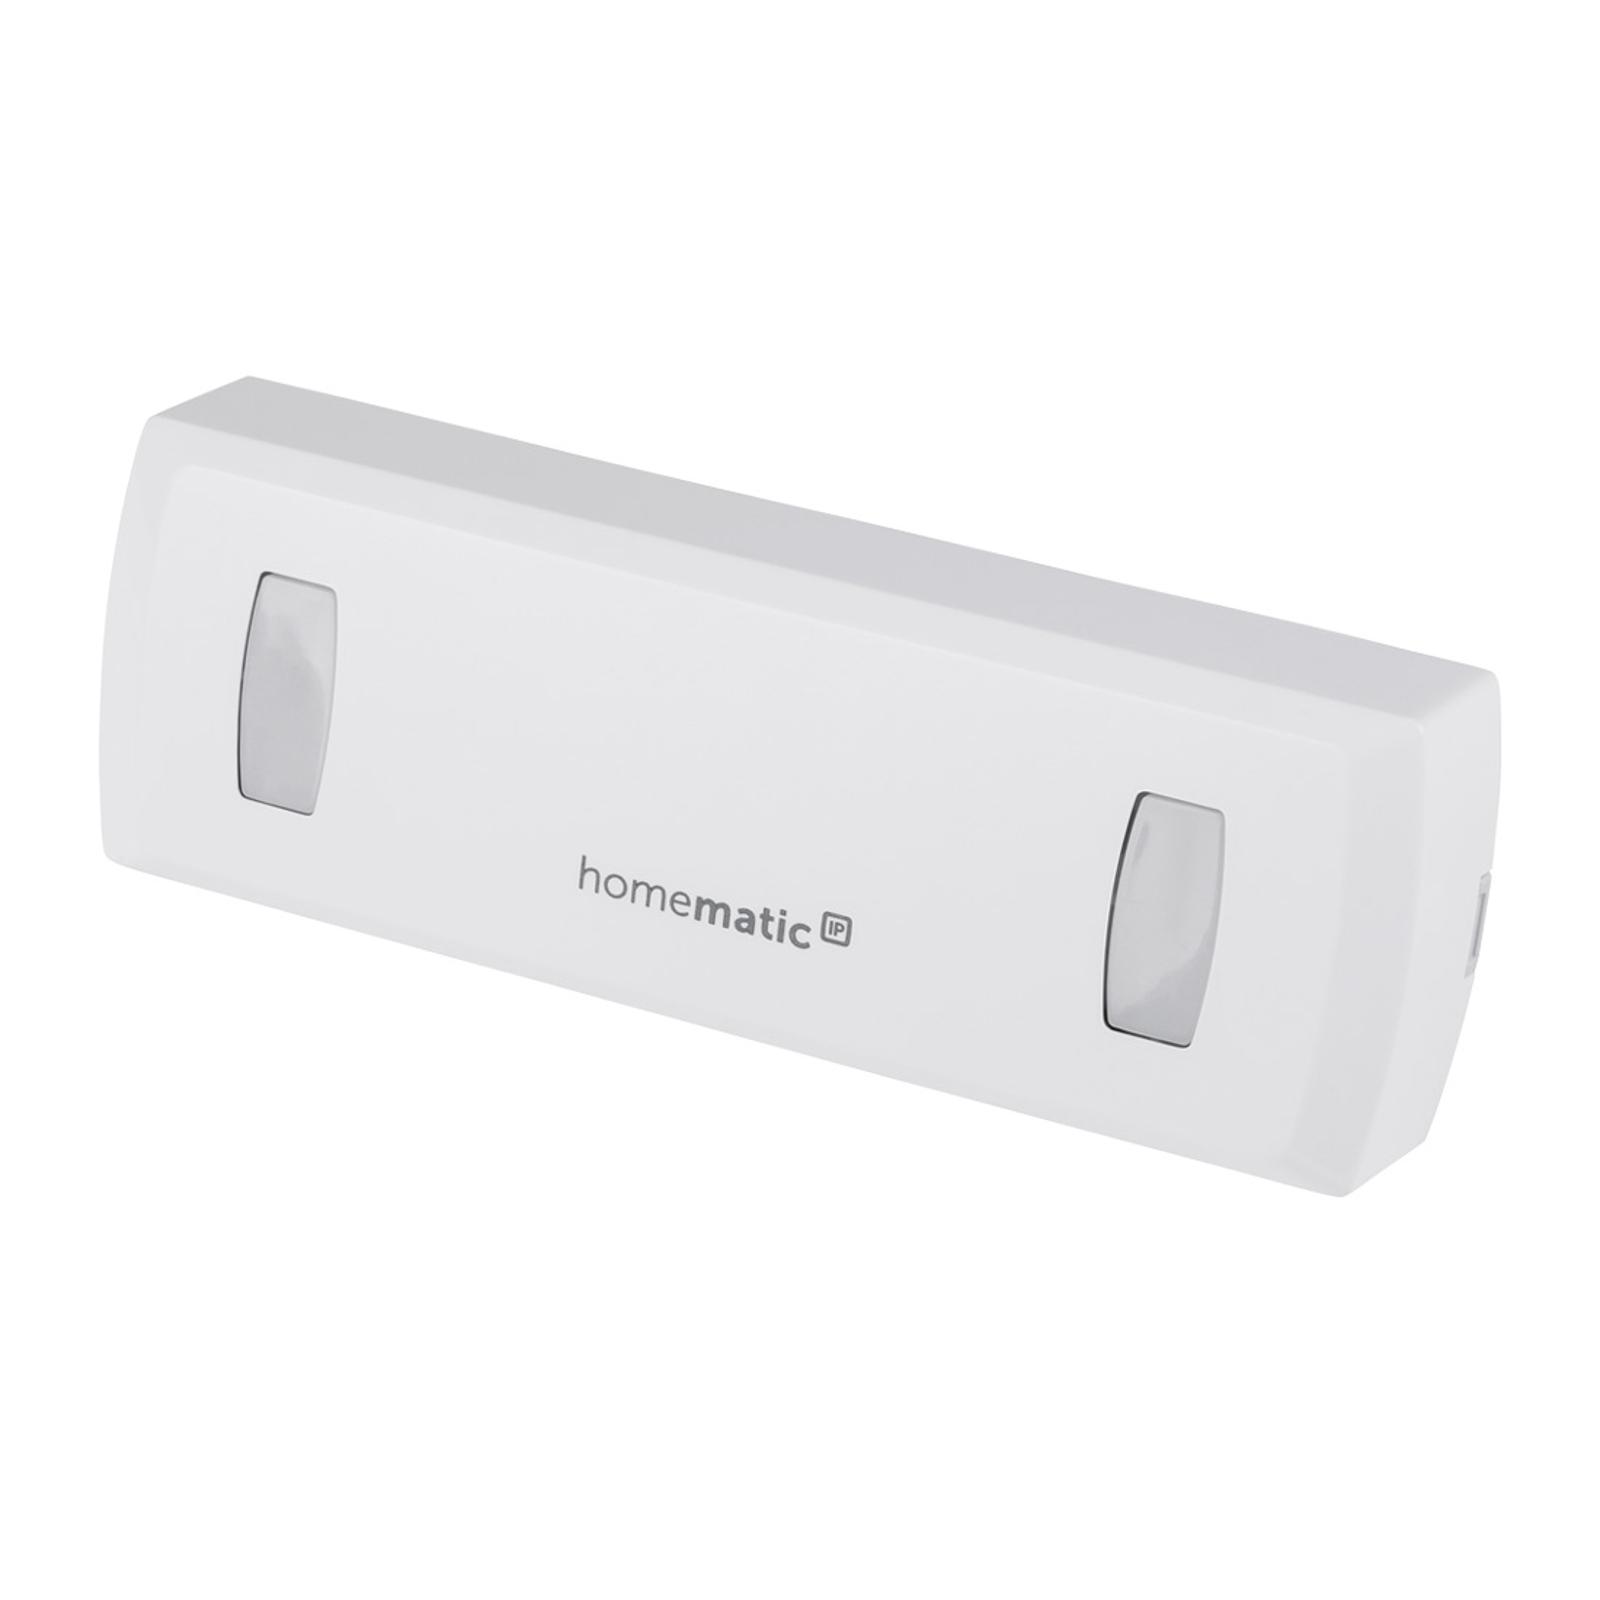 Homematic IP genomgångssensor